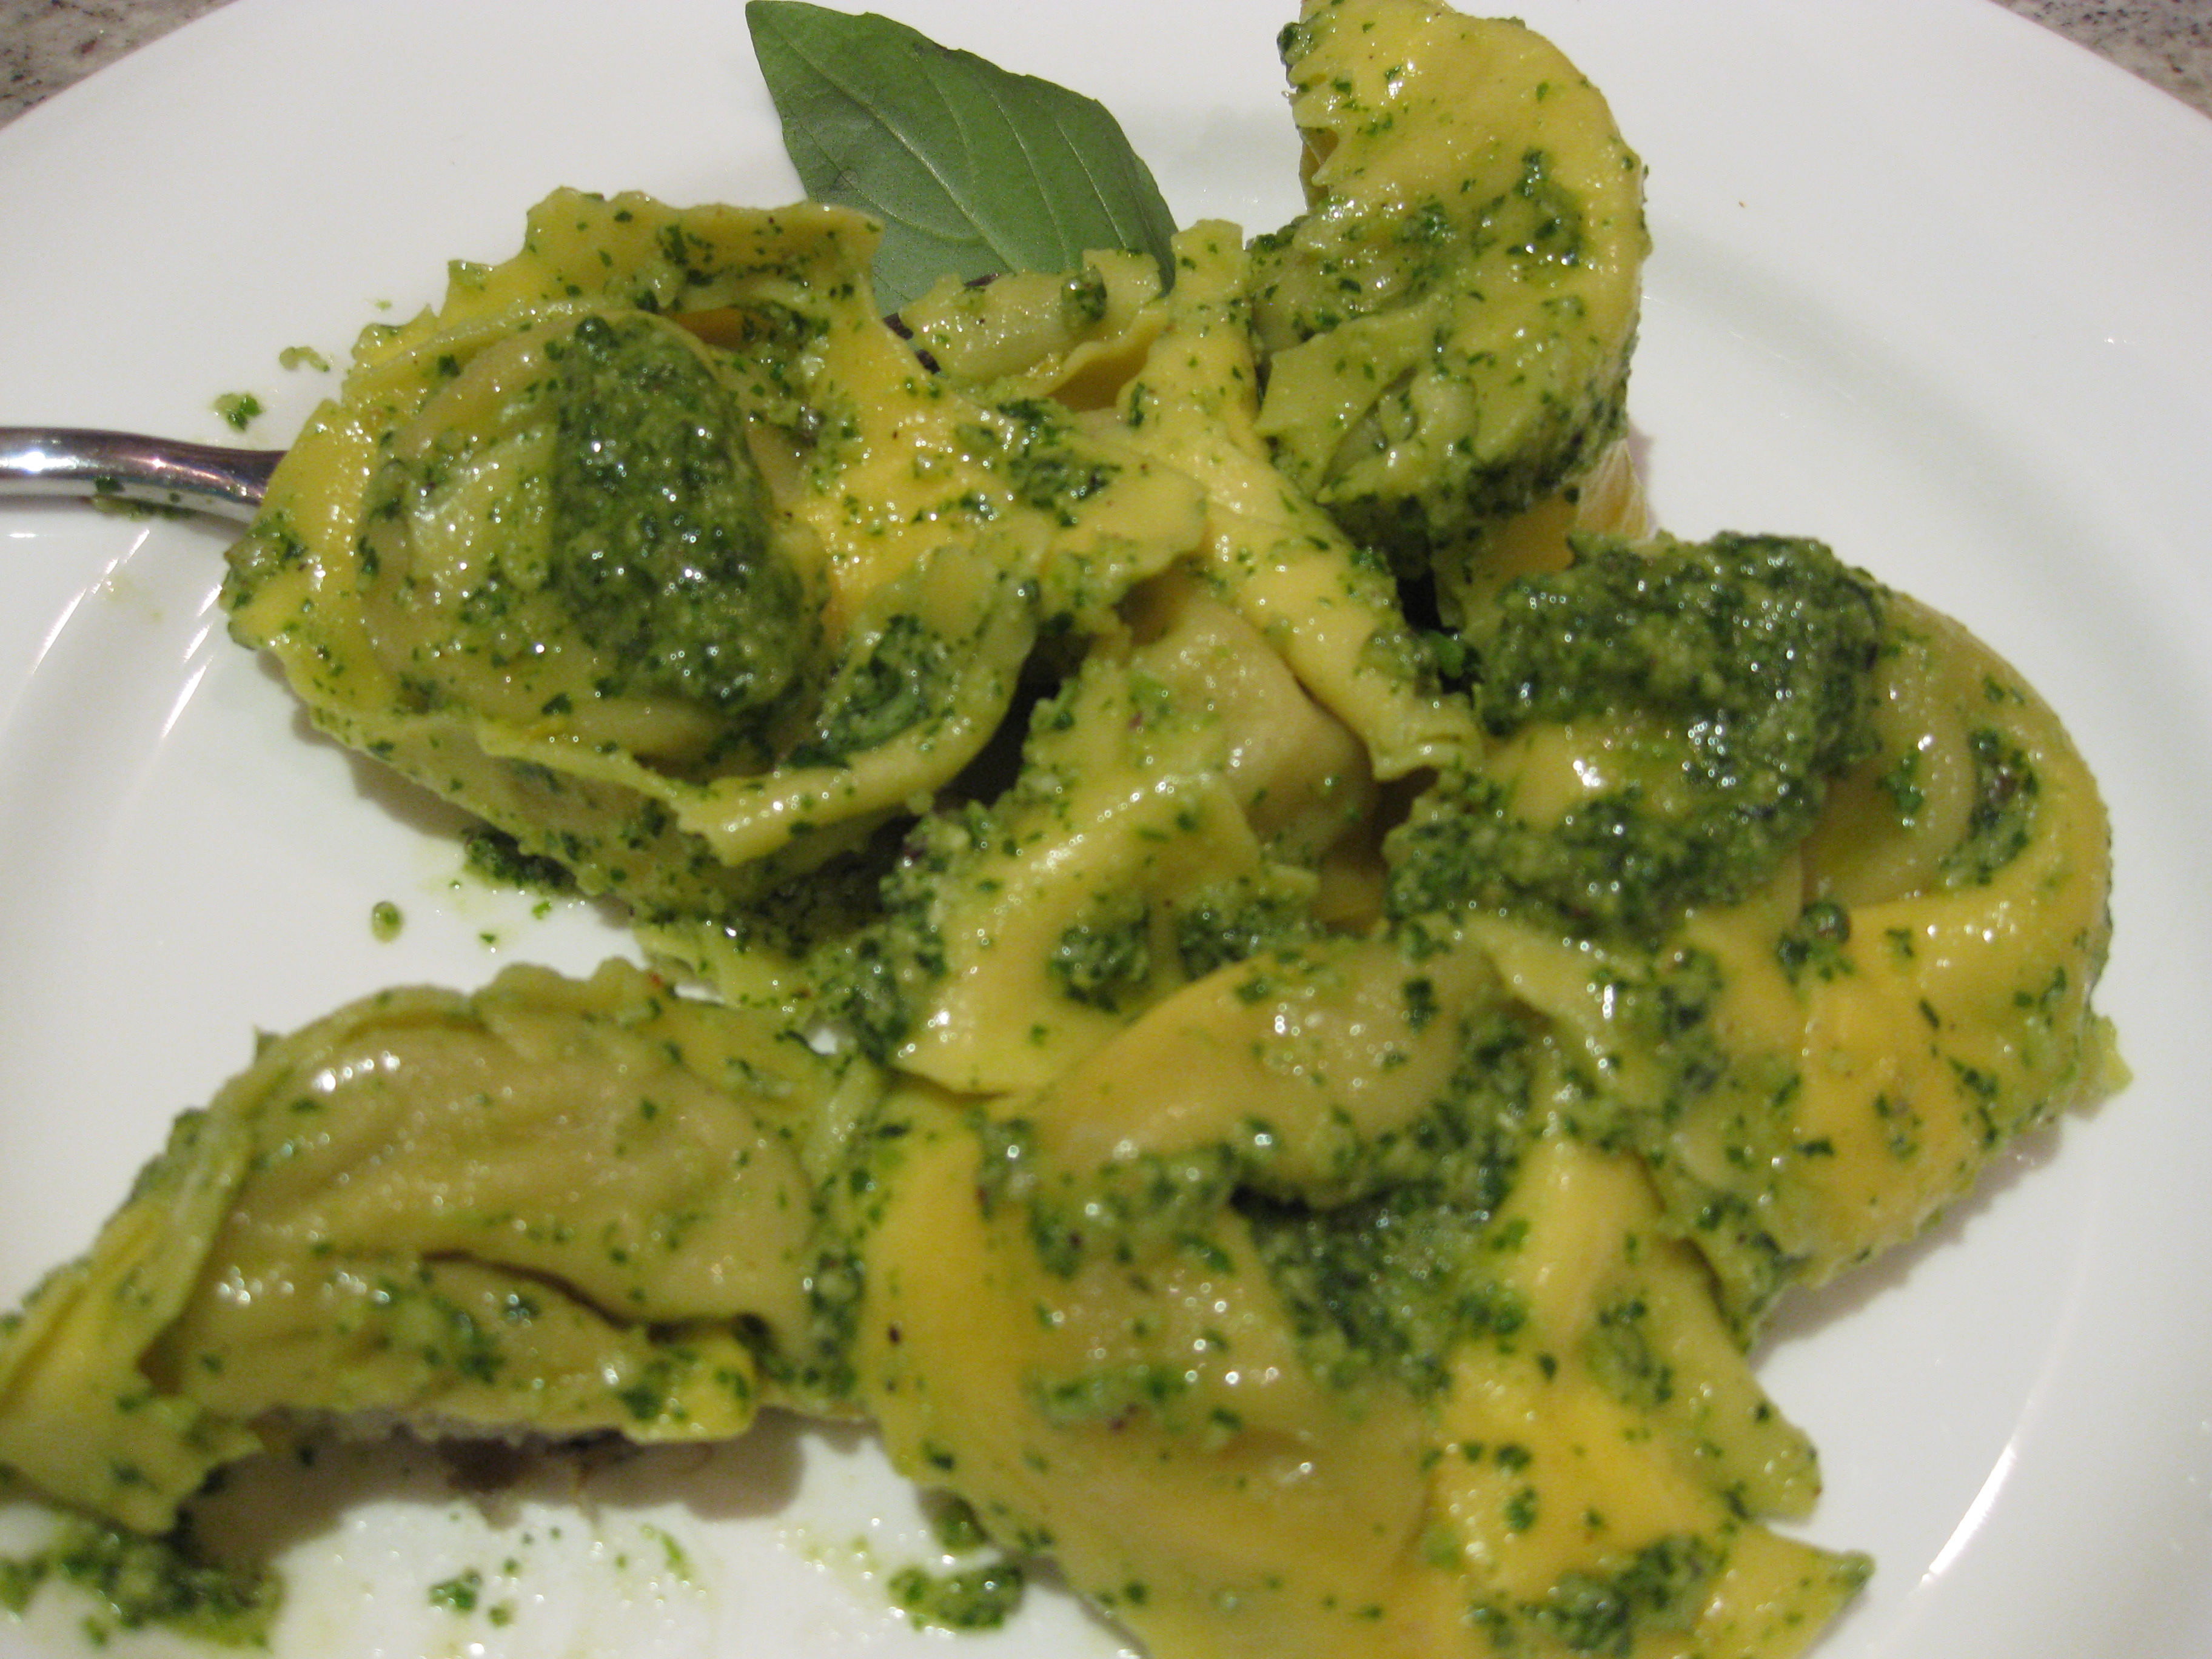 Artichoke ravioli with homemade pesto